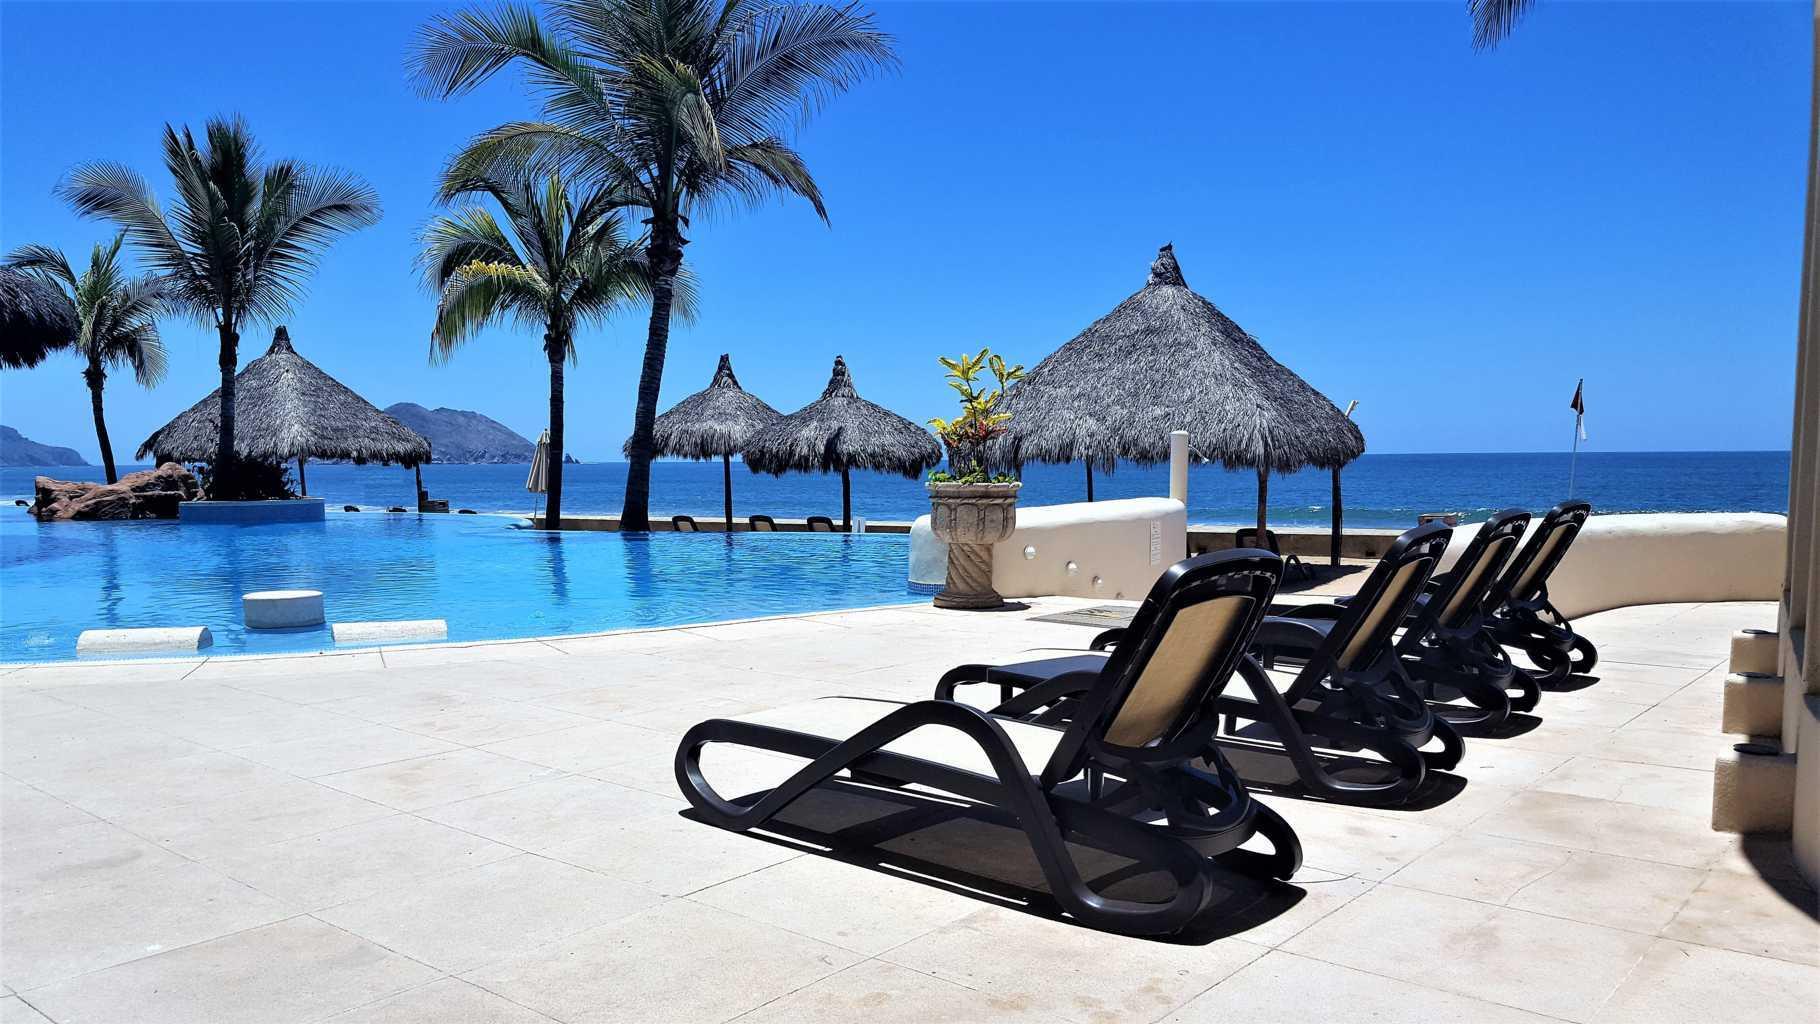 Condominium in a 5-star beachfront resort – DISCOUNTED!